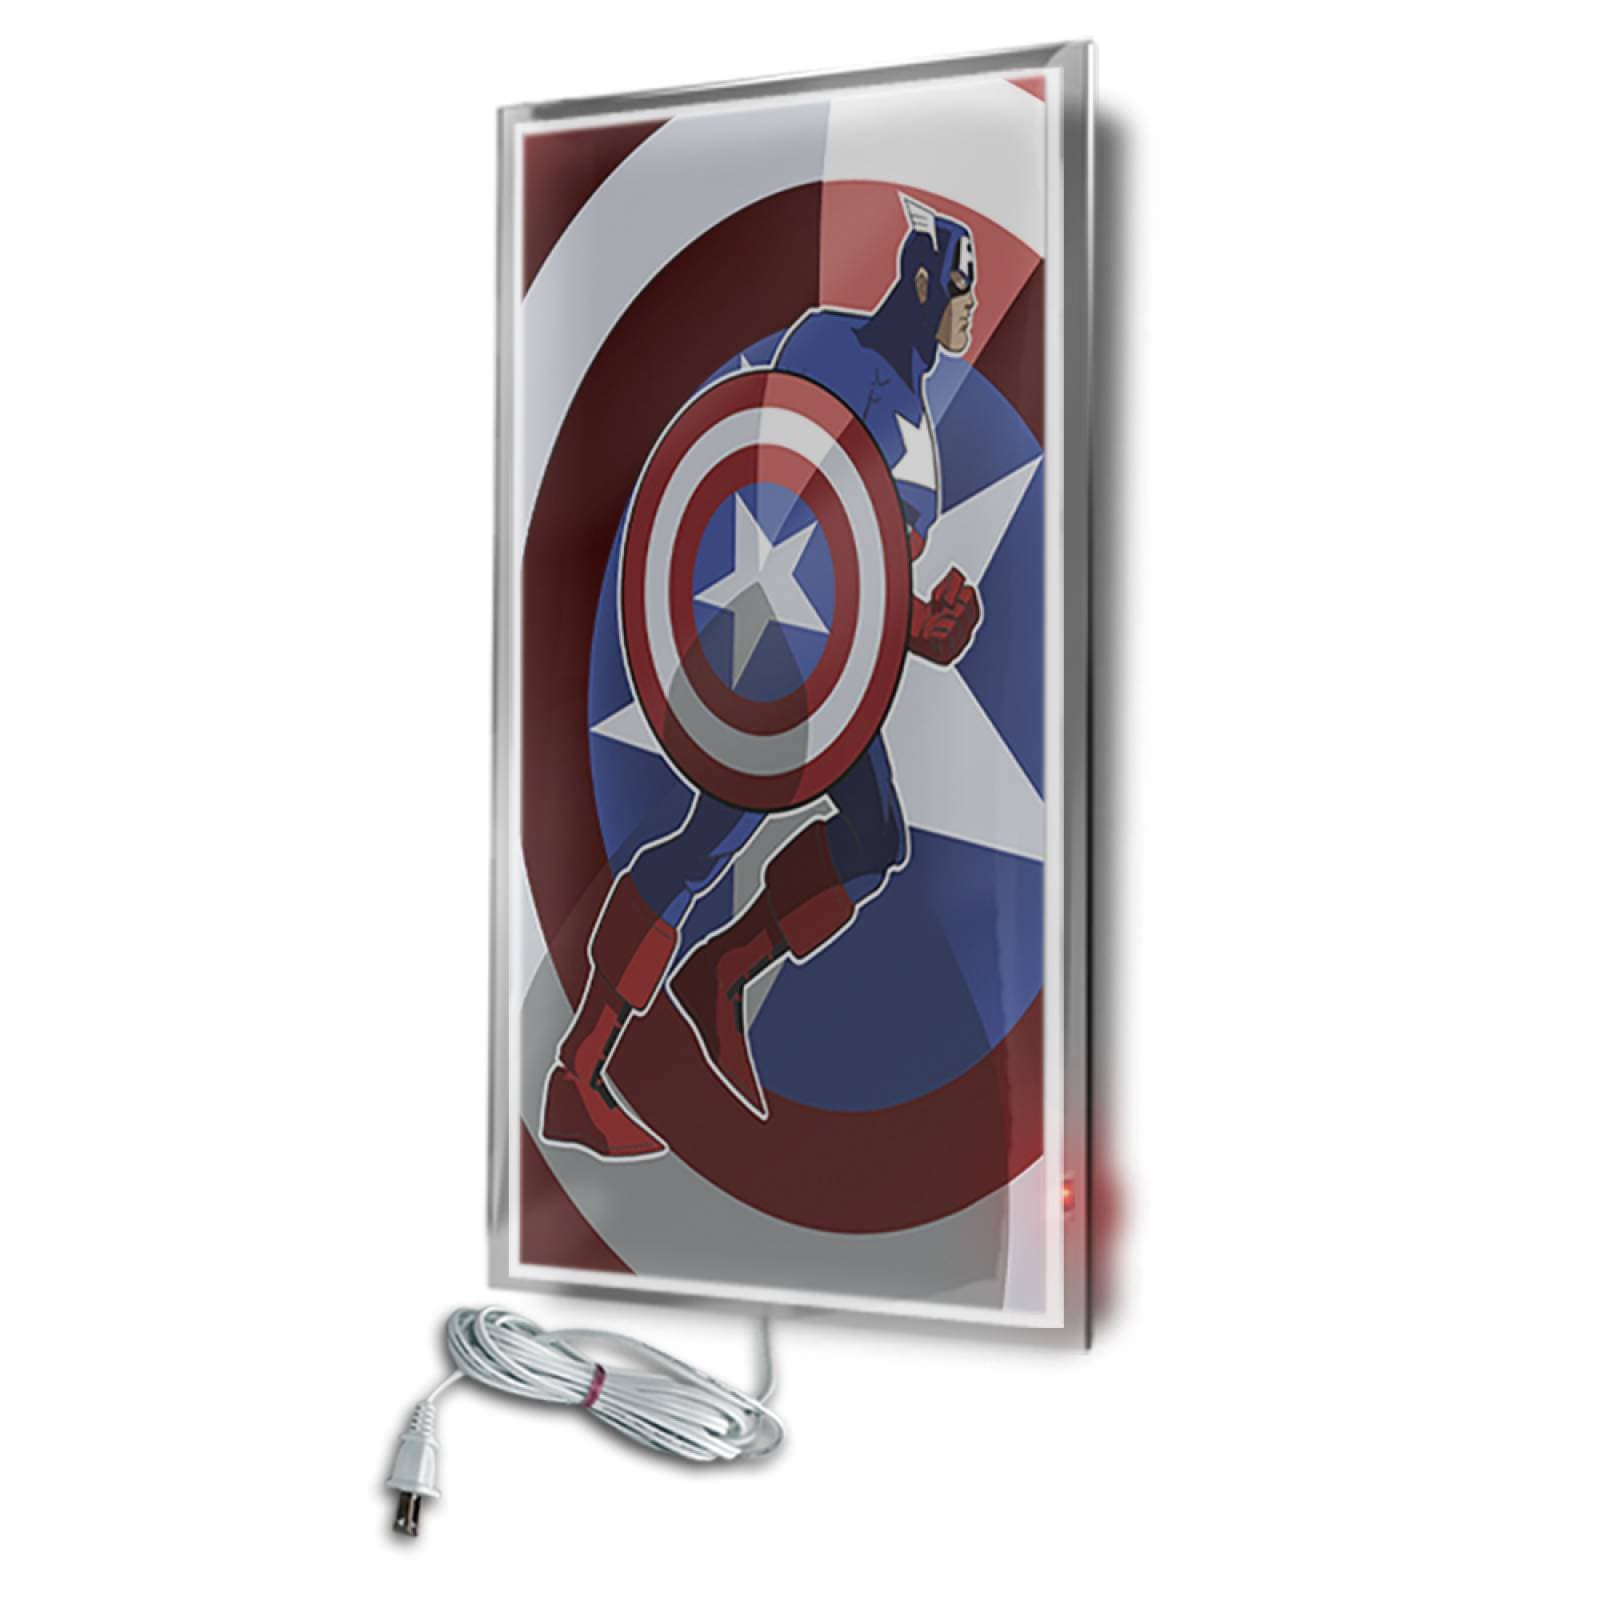 Calefactor de Panel infrarrojo en Cristal para Pared, California Wave Capitán América de 380W 60x90cm, Mod: 135CaSol